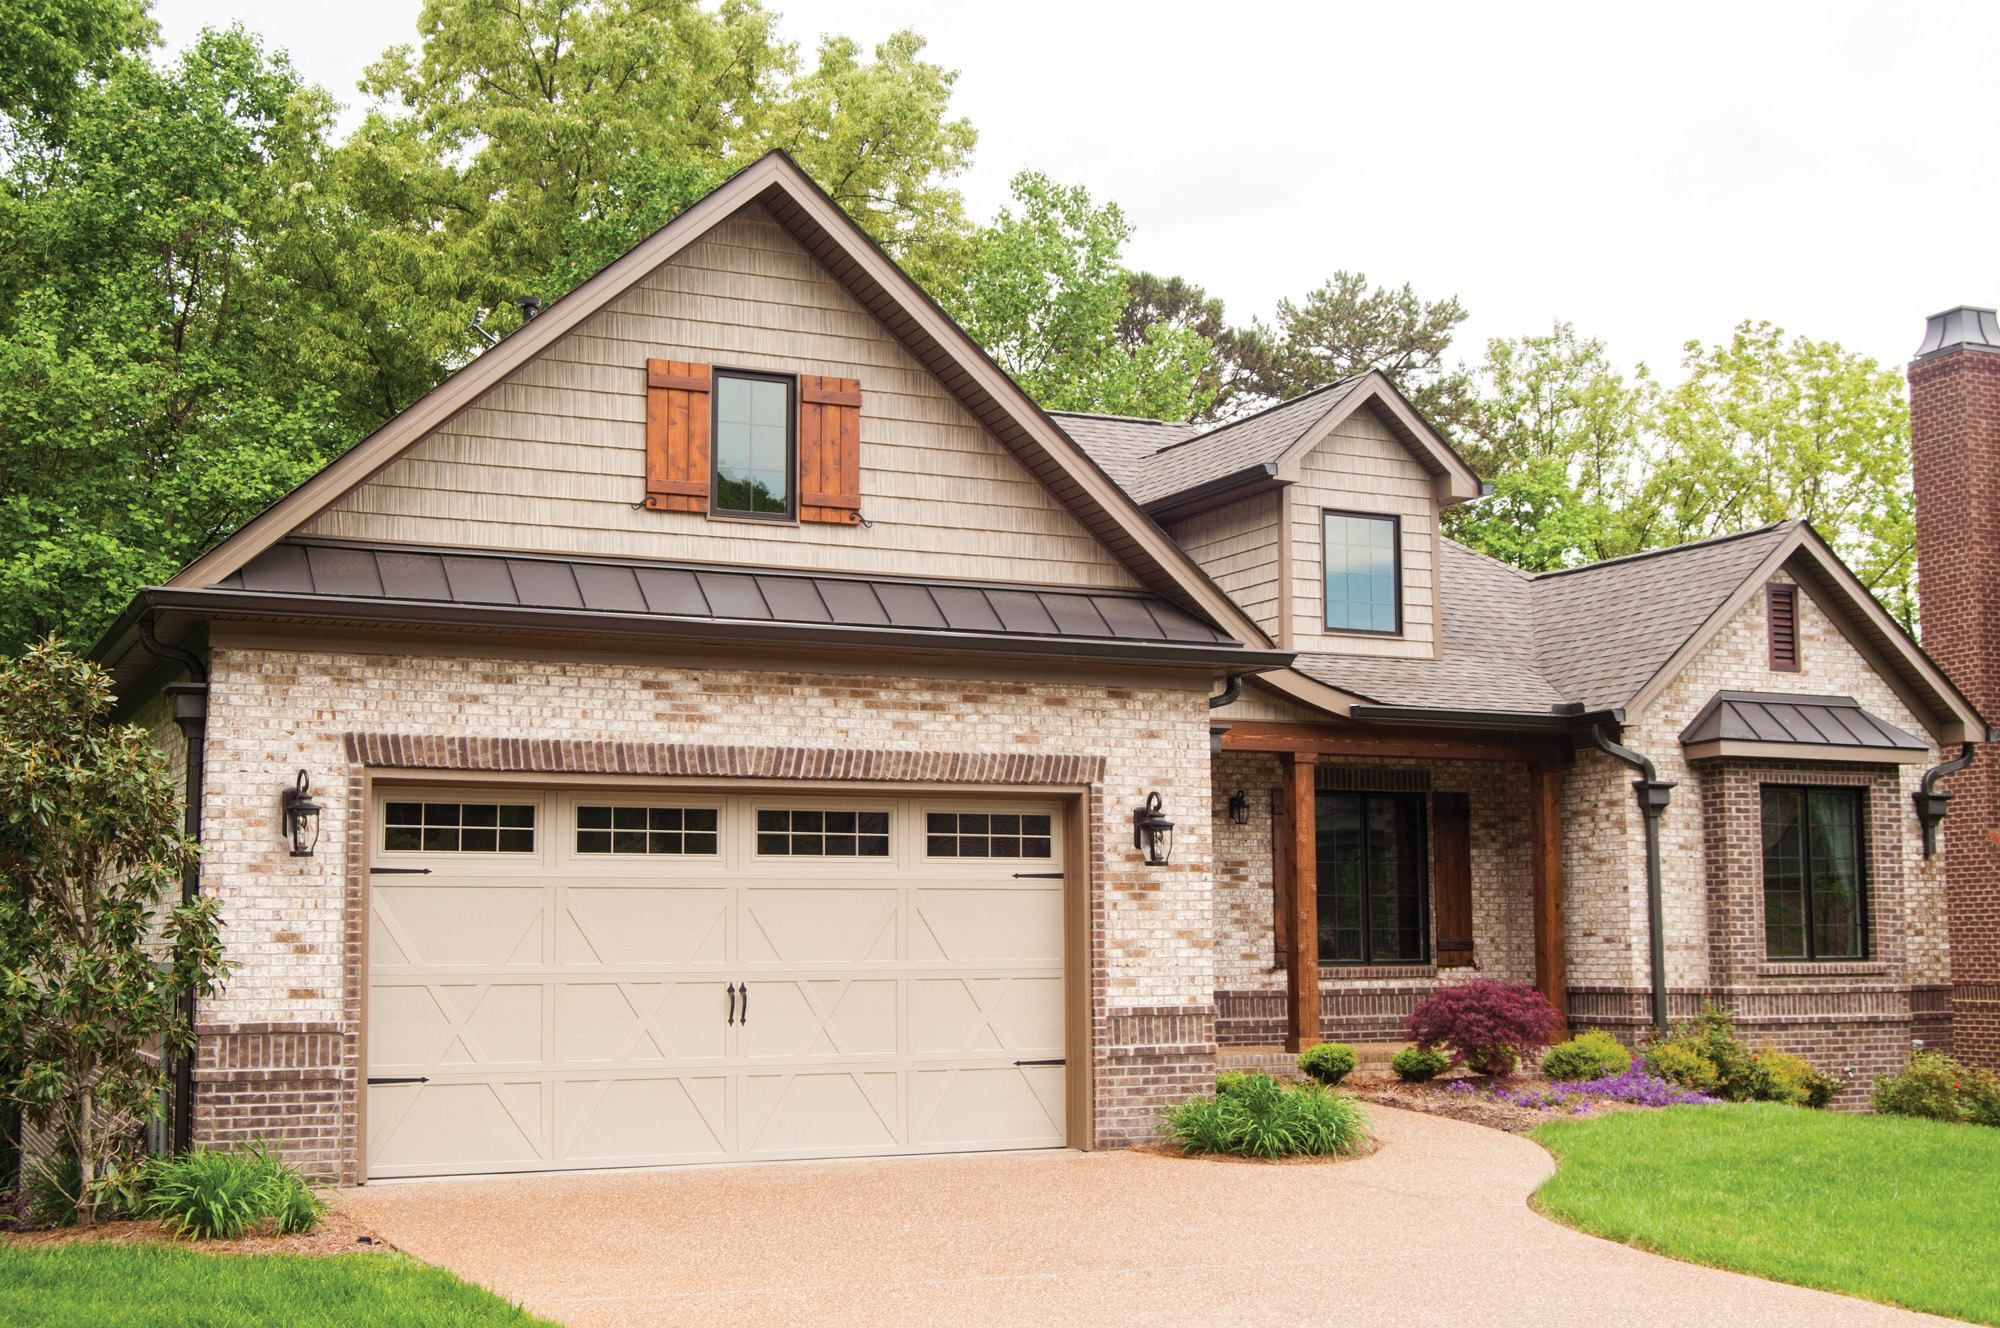 Carriage House Style Garage Door Brings Old World Charm Garage Door Design House Exterior House Designs Exterior